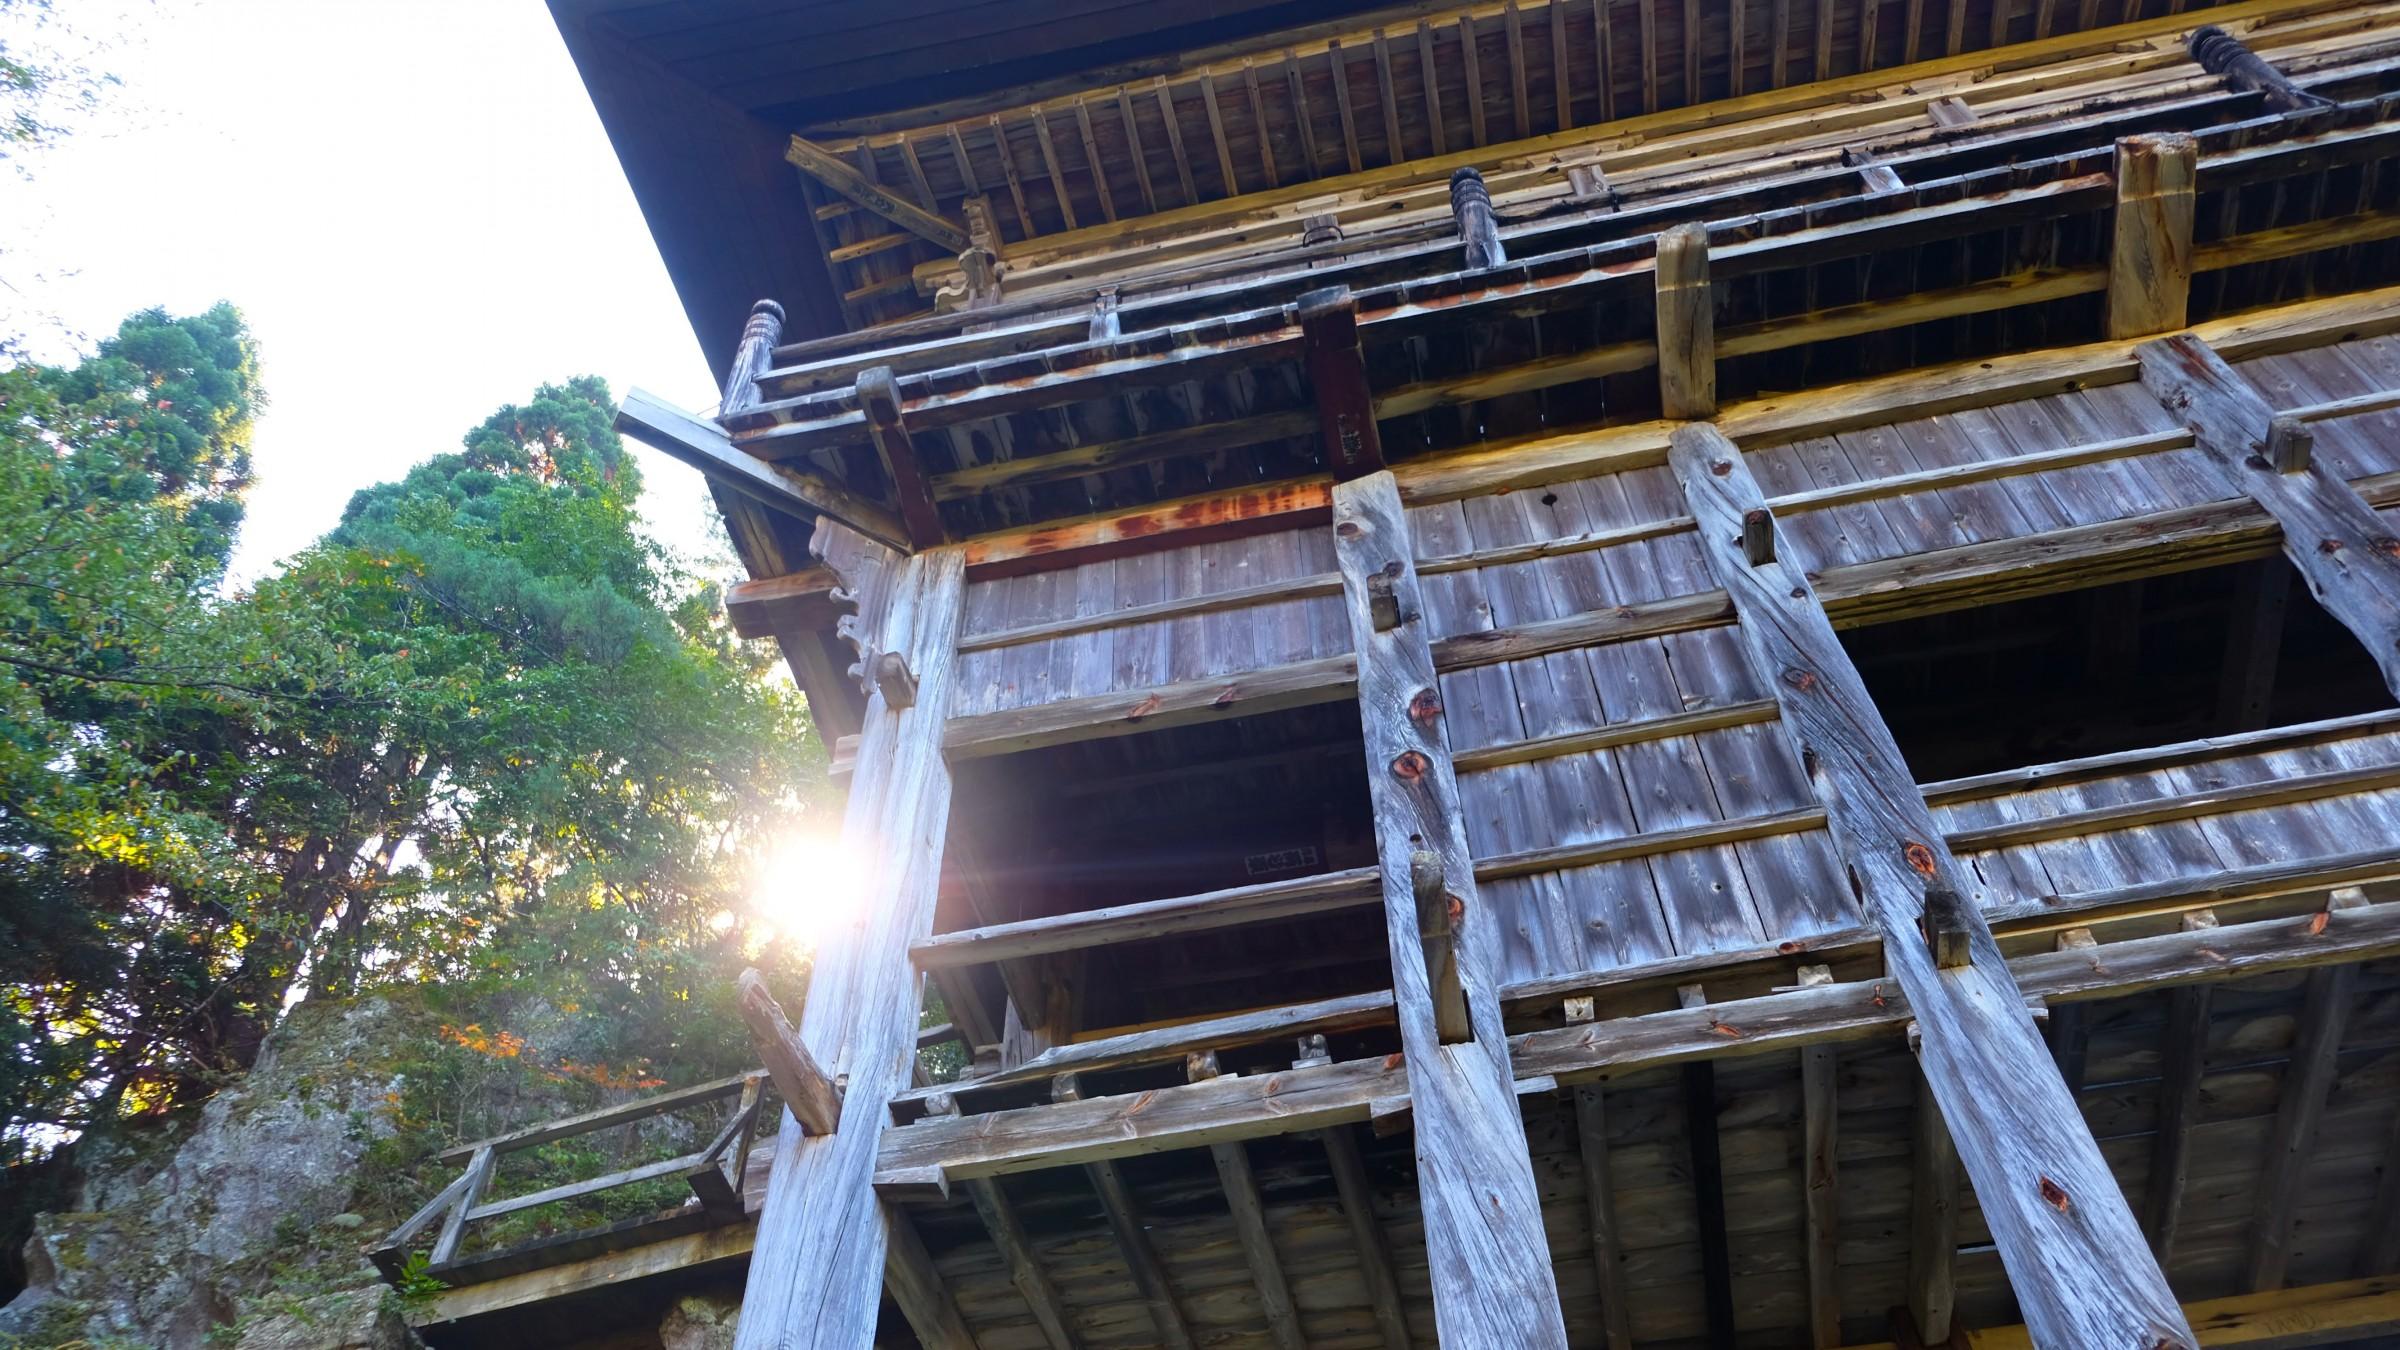 Sakudari Kannon, a stilted Buddhist temple built against a cliff face